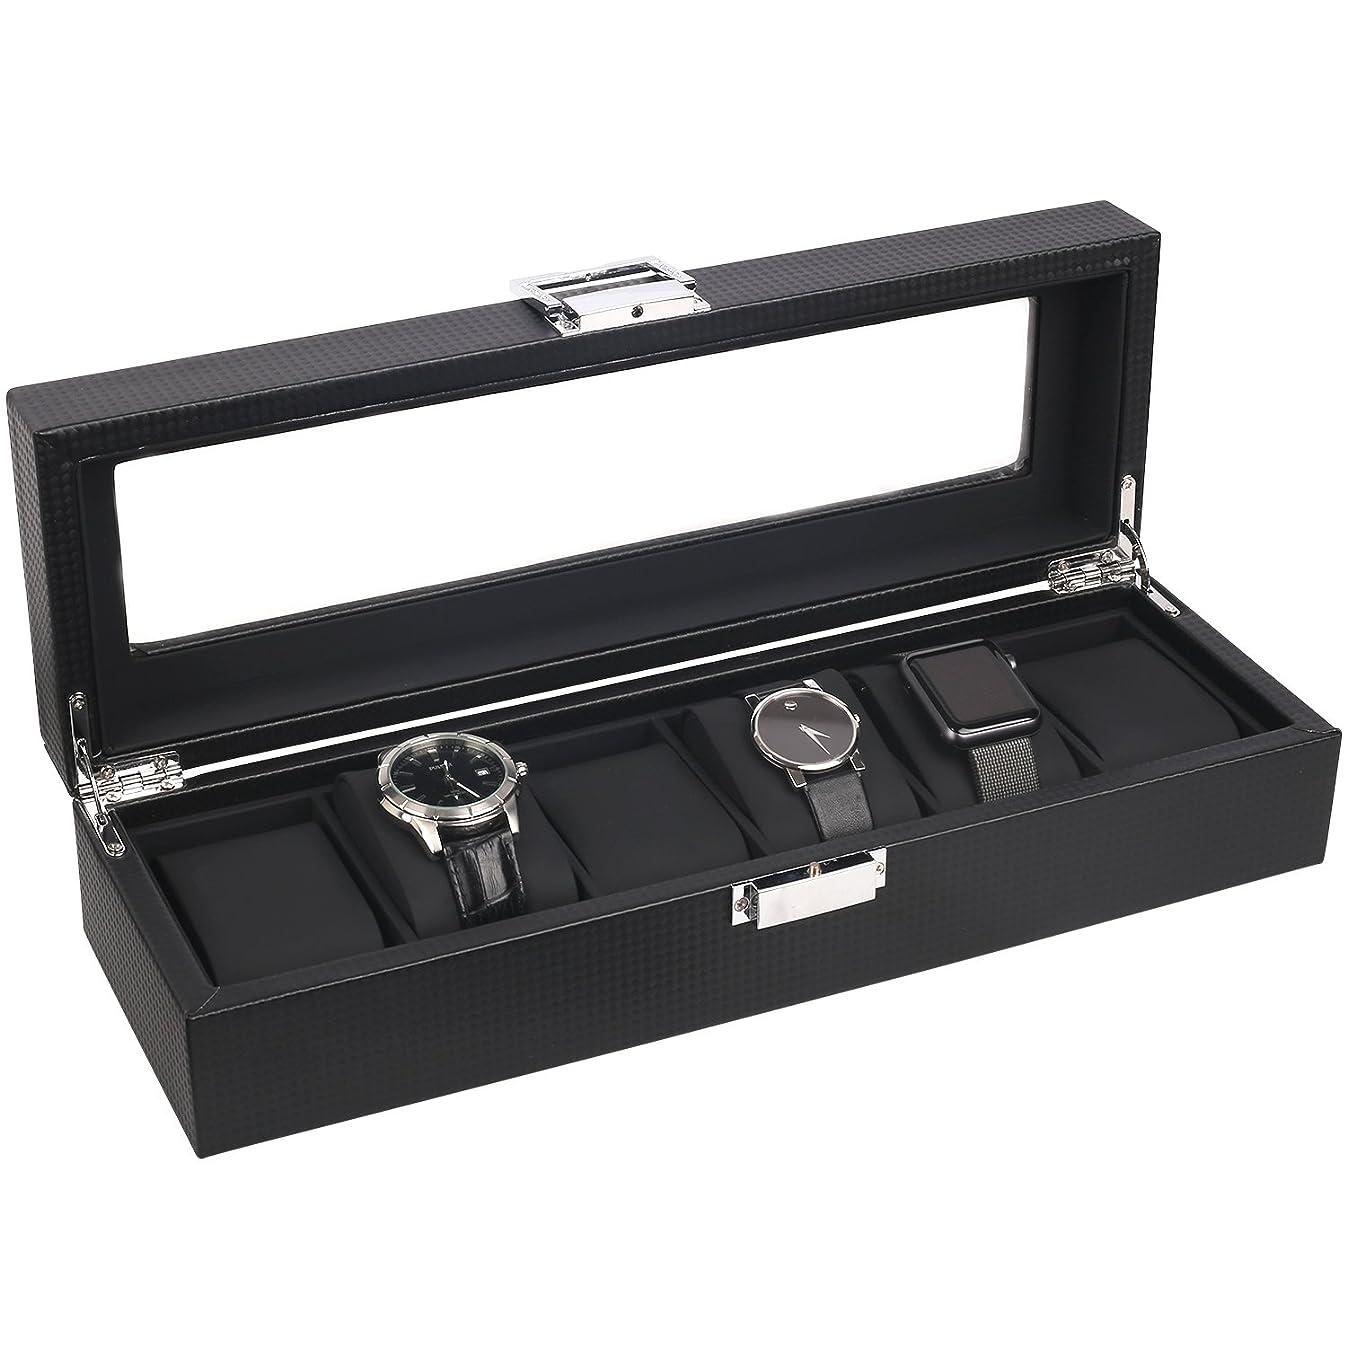 Mantello 6-Watch Box Carbon Fiber Design with Glass Top